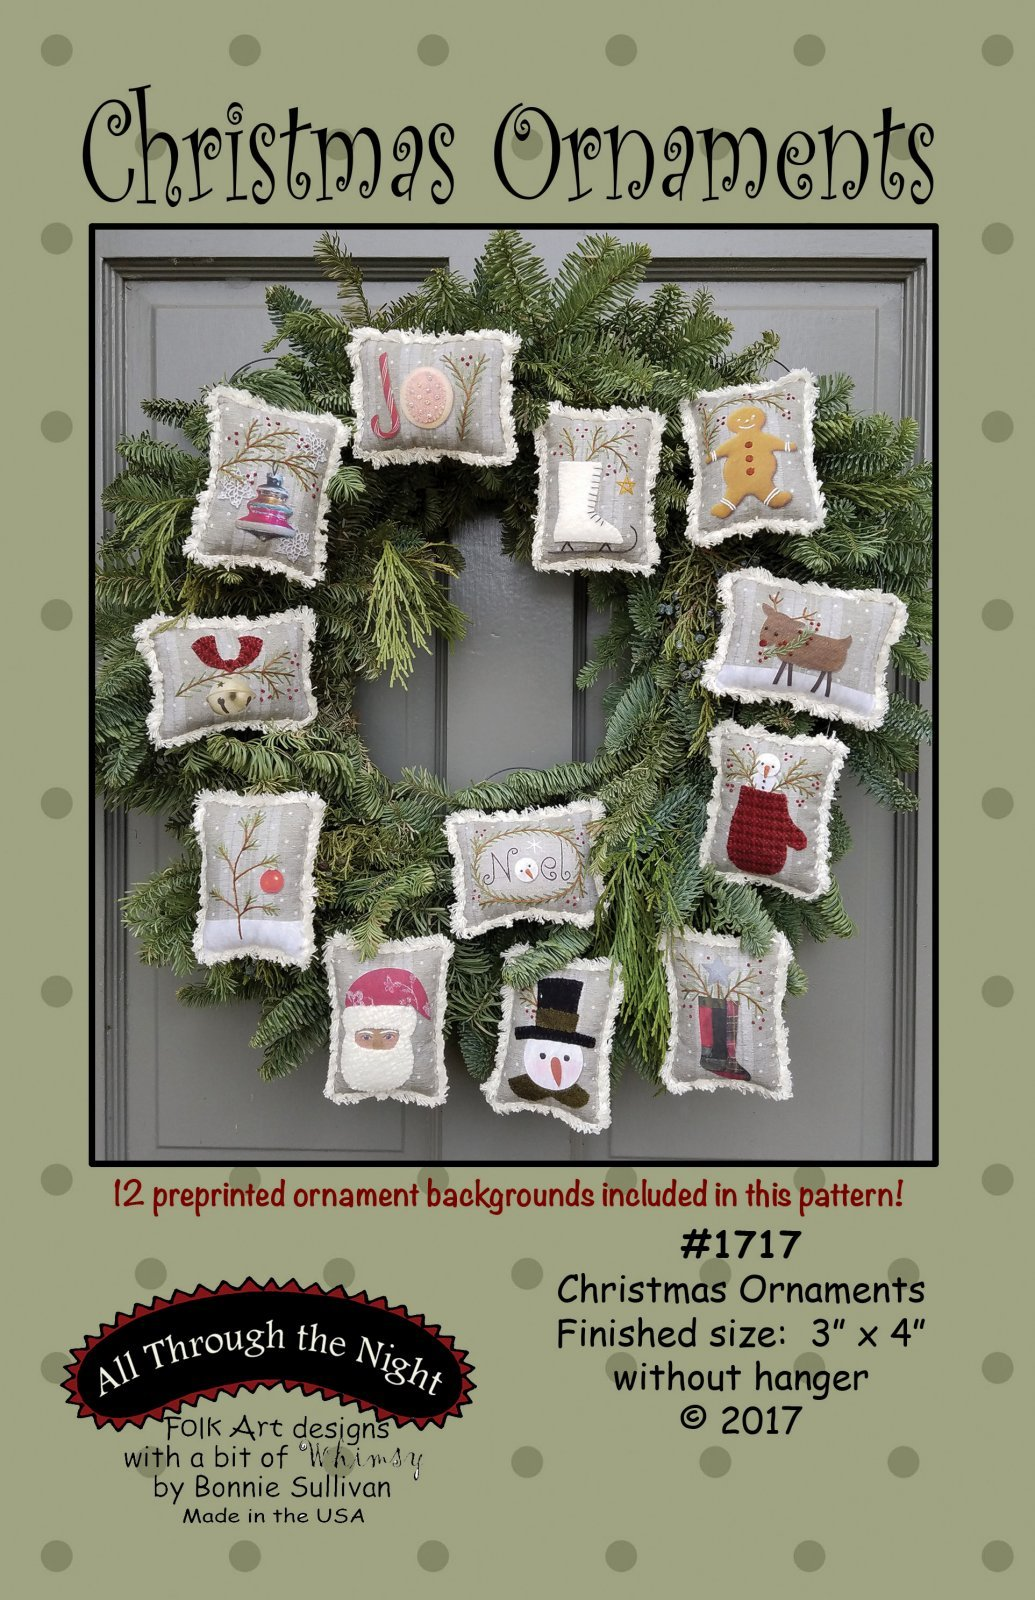 Christmas Ornaments All Through the Night by Bonnie Sullivan